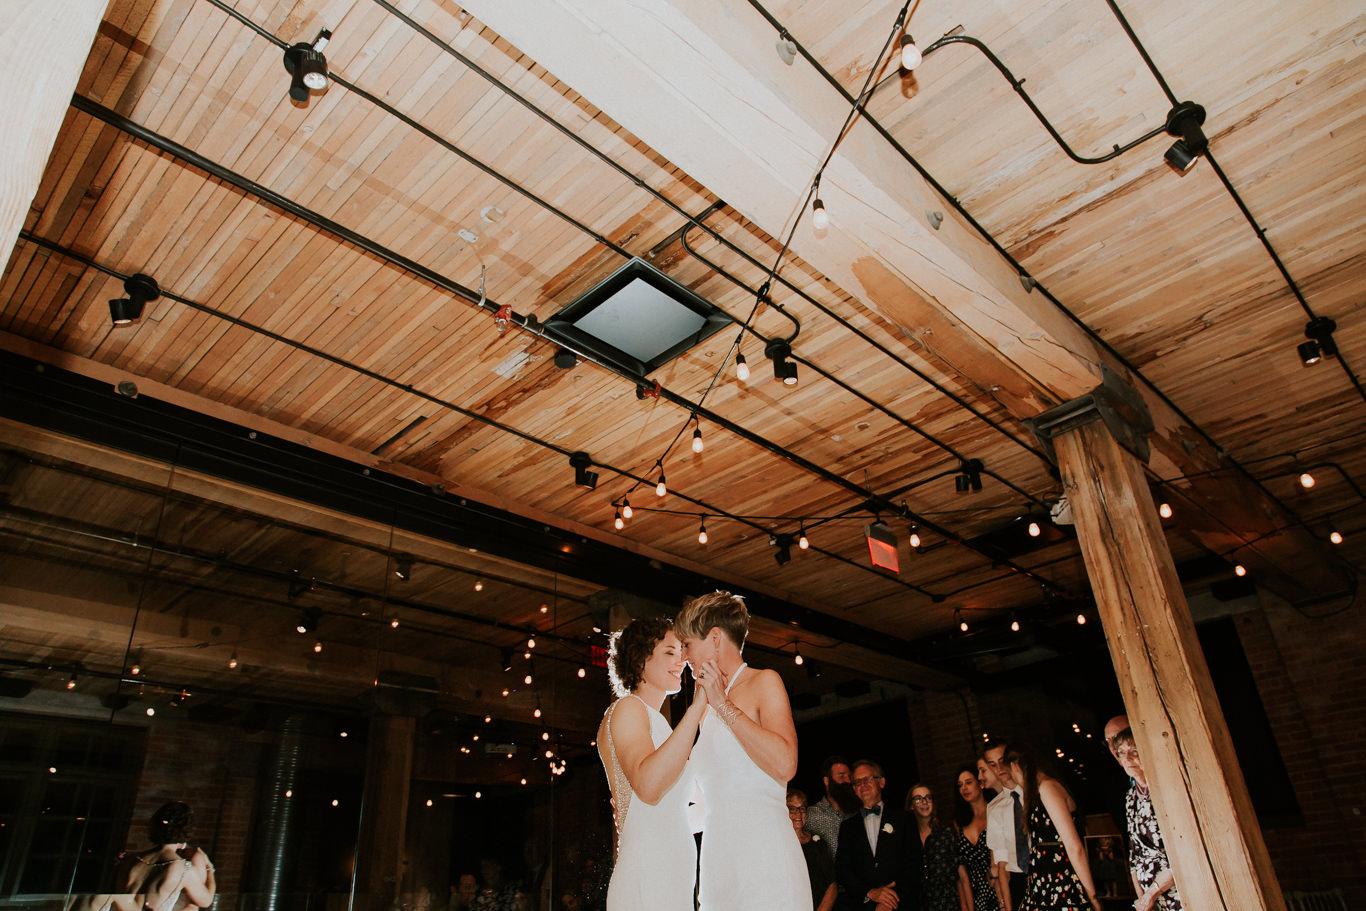 Lindsay-and-Heather-Charbar-Restaurant-Wedding-in-Calgary-207